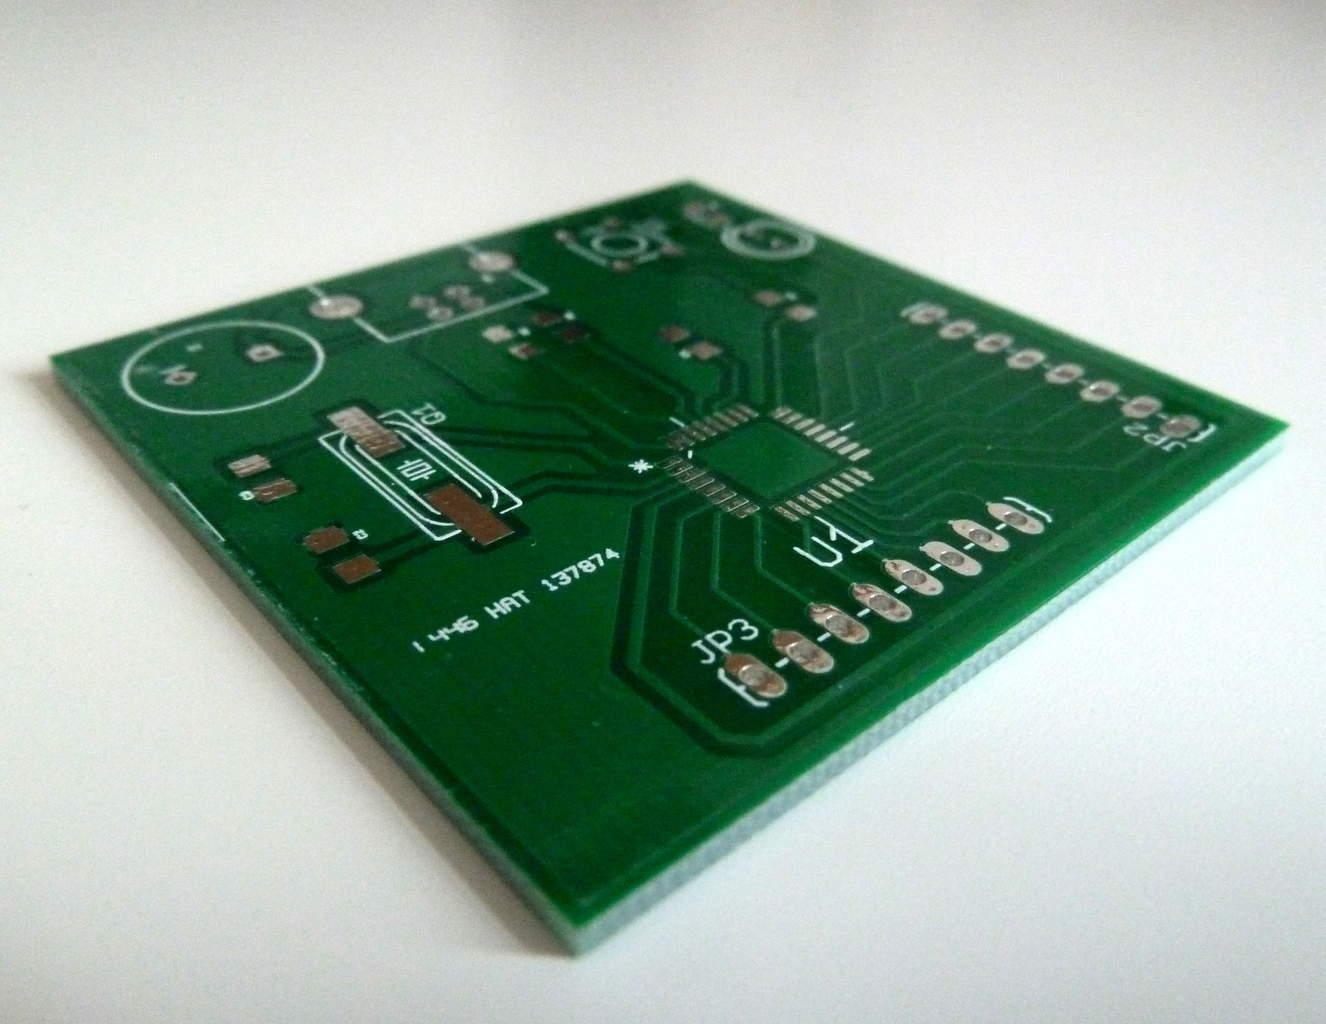 Microcontroller Tutorial 5/5: Soldering And Programming